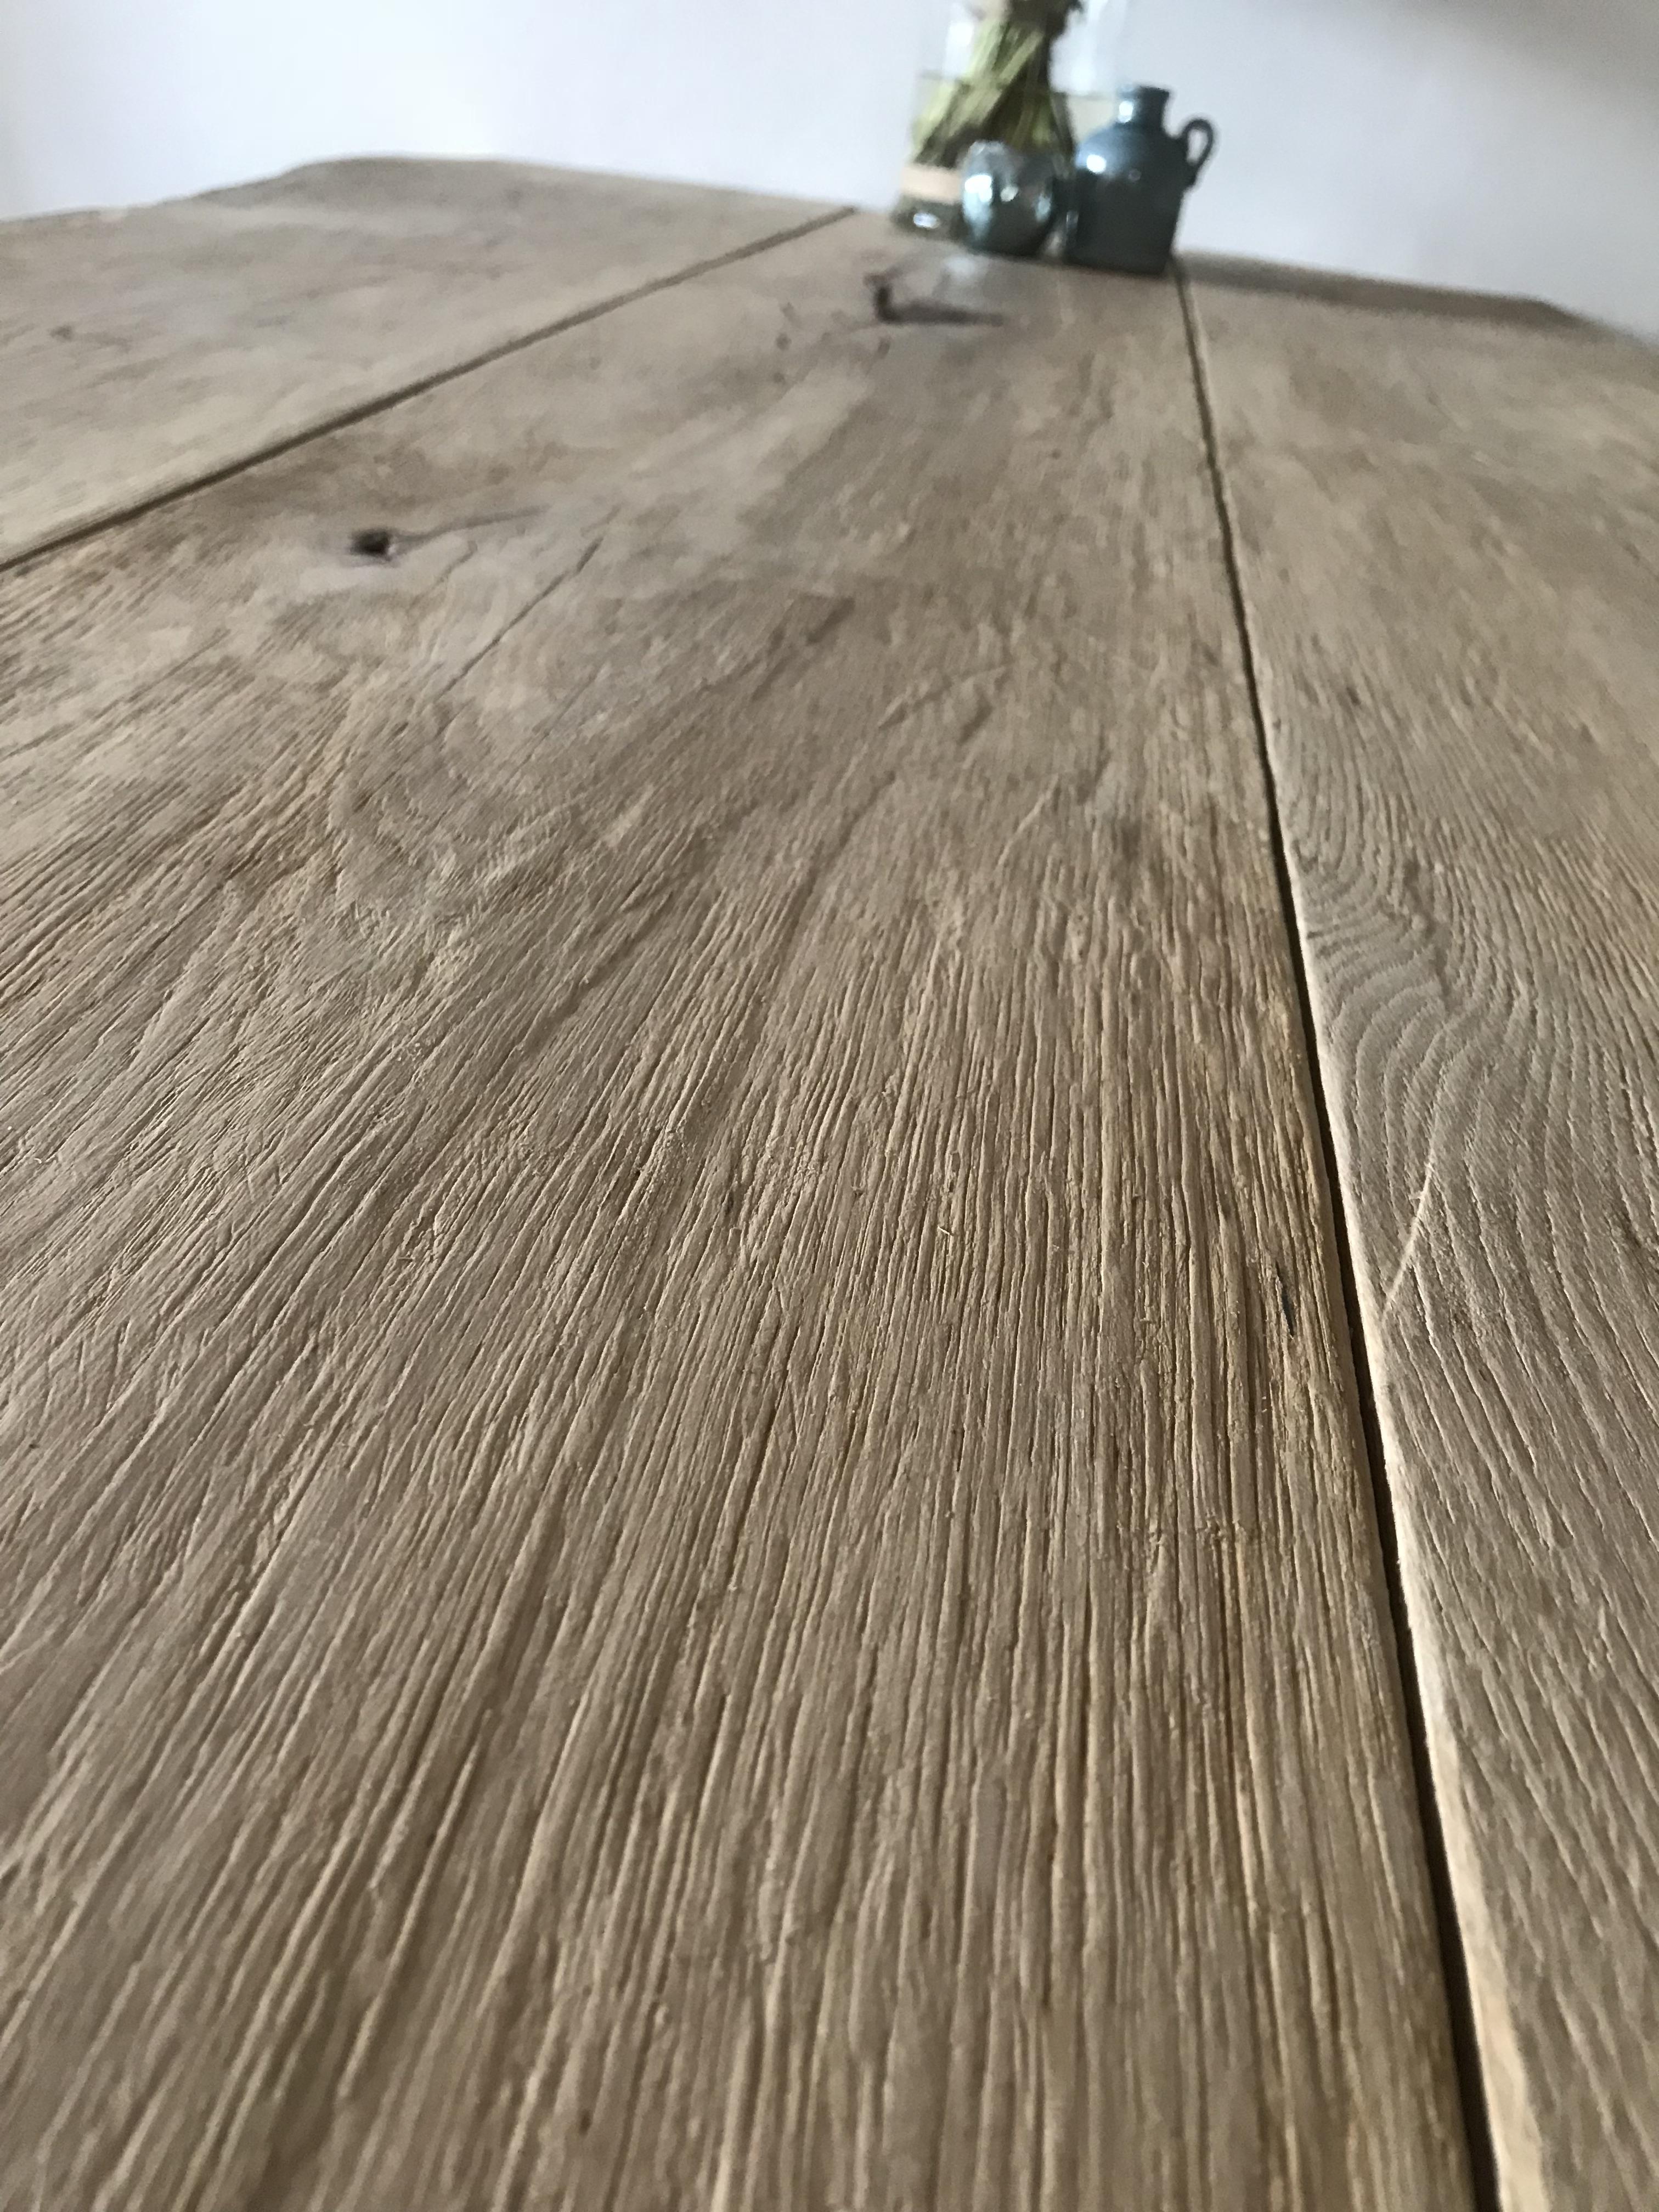 Eikenhouten boomstamtafel